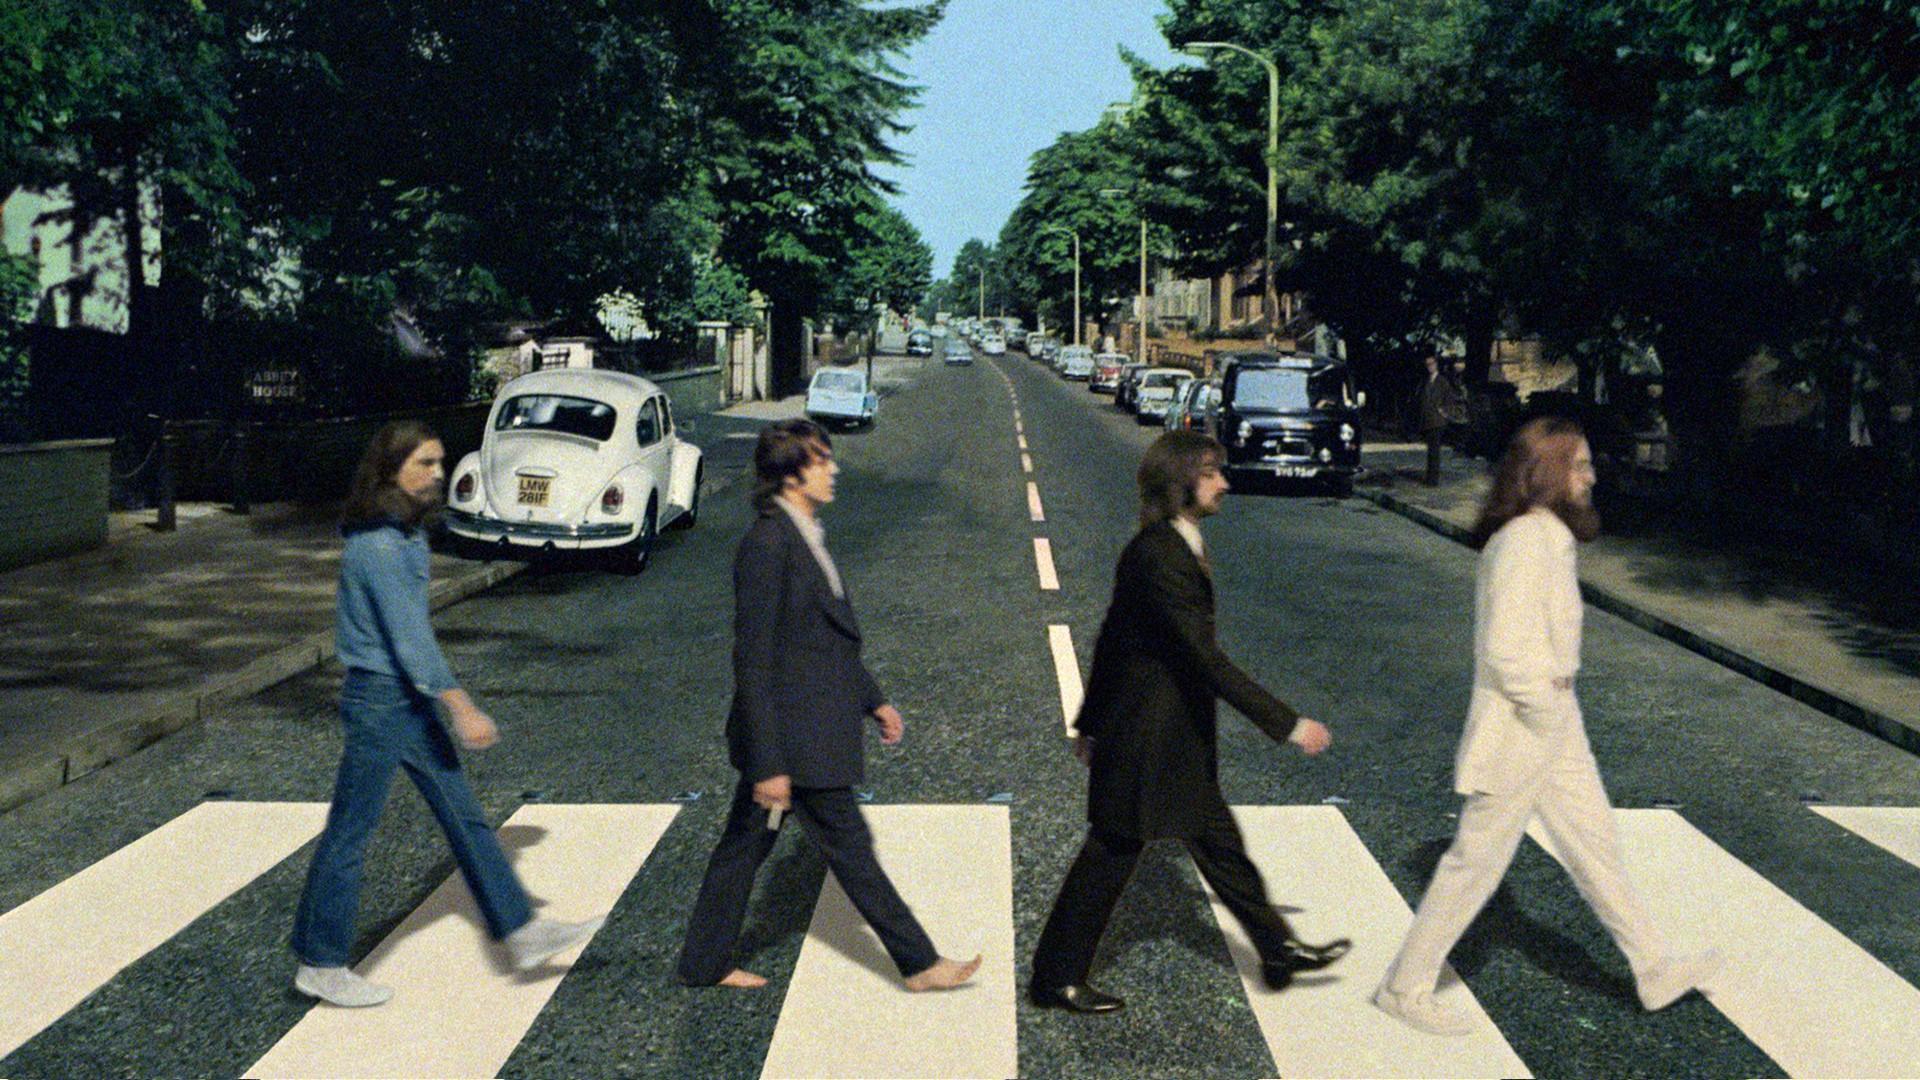 43] Abbey Road Wallpaper on WallpaperSafari 1920x1080